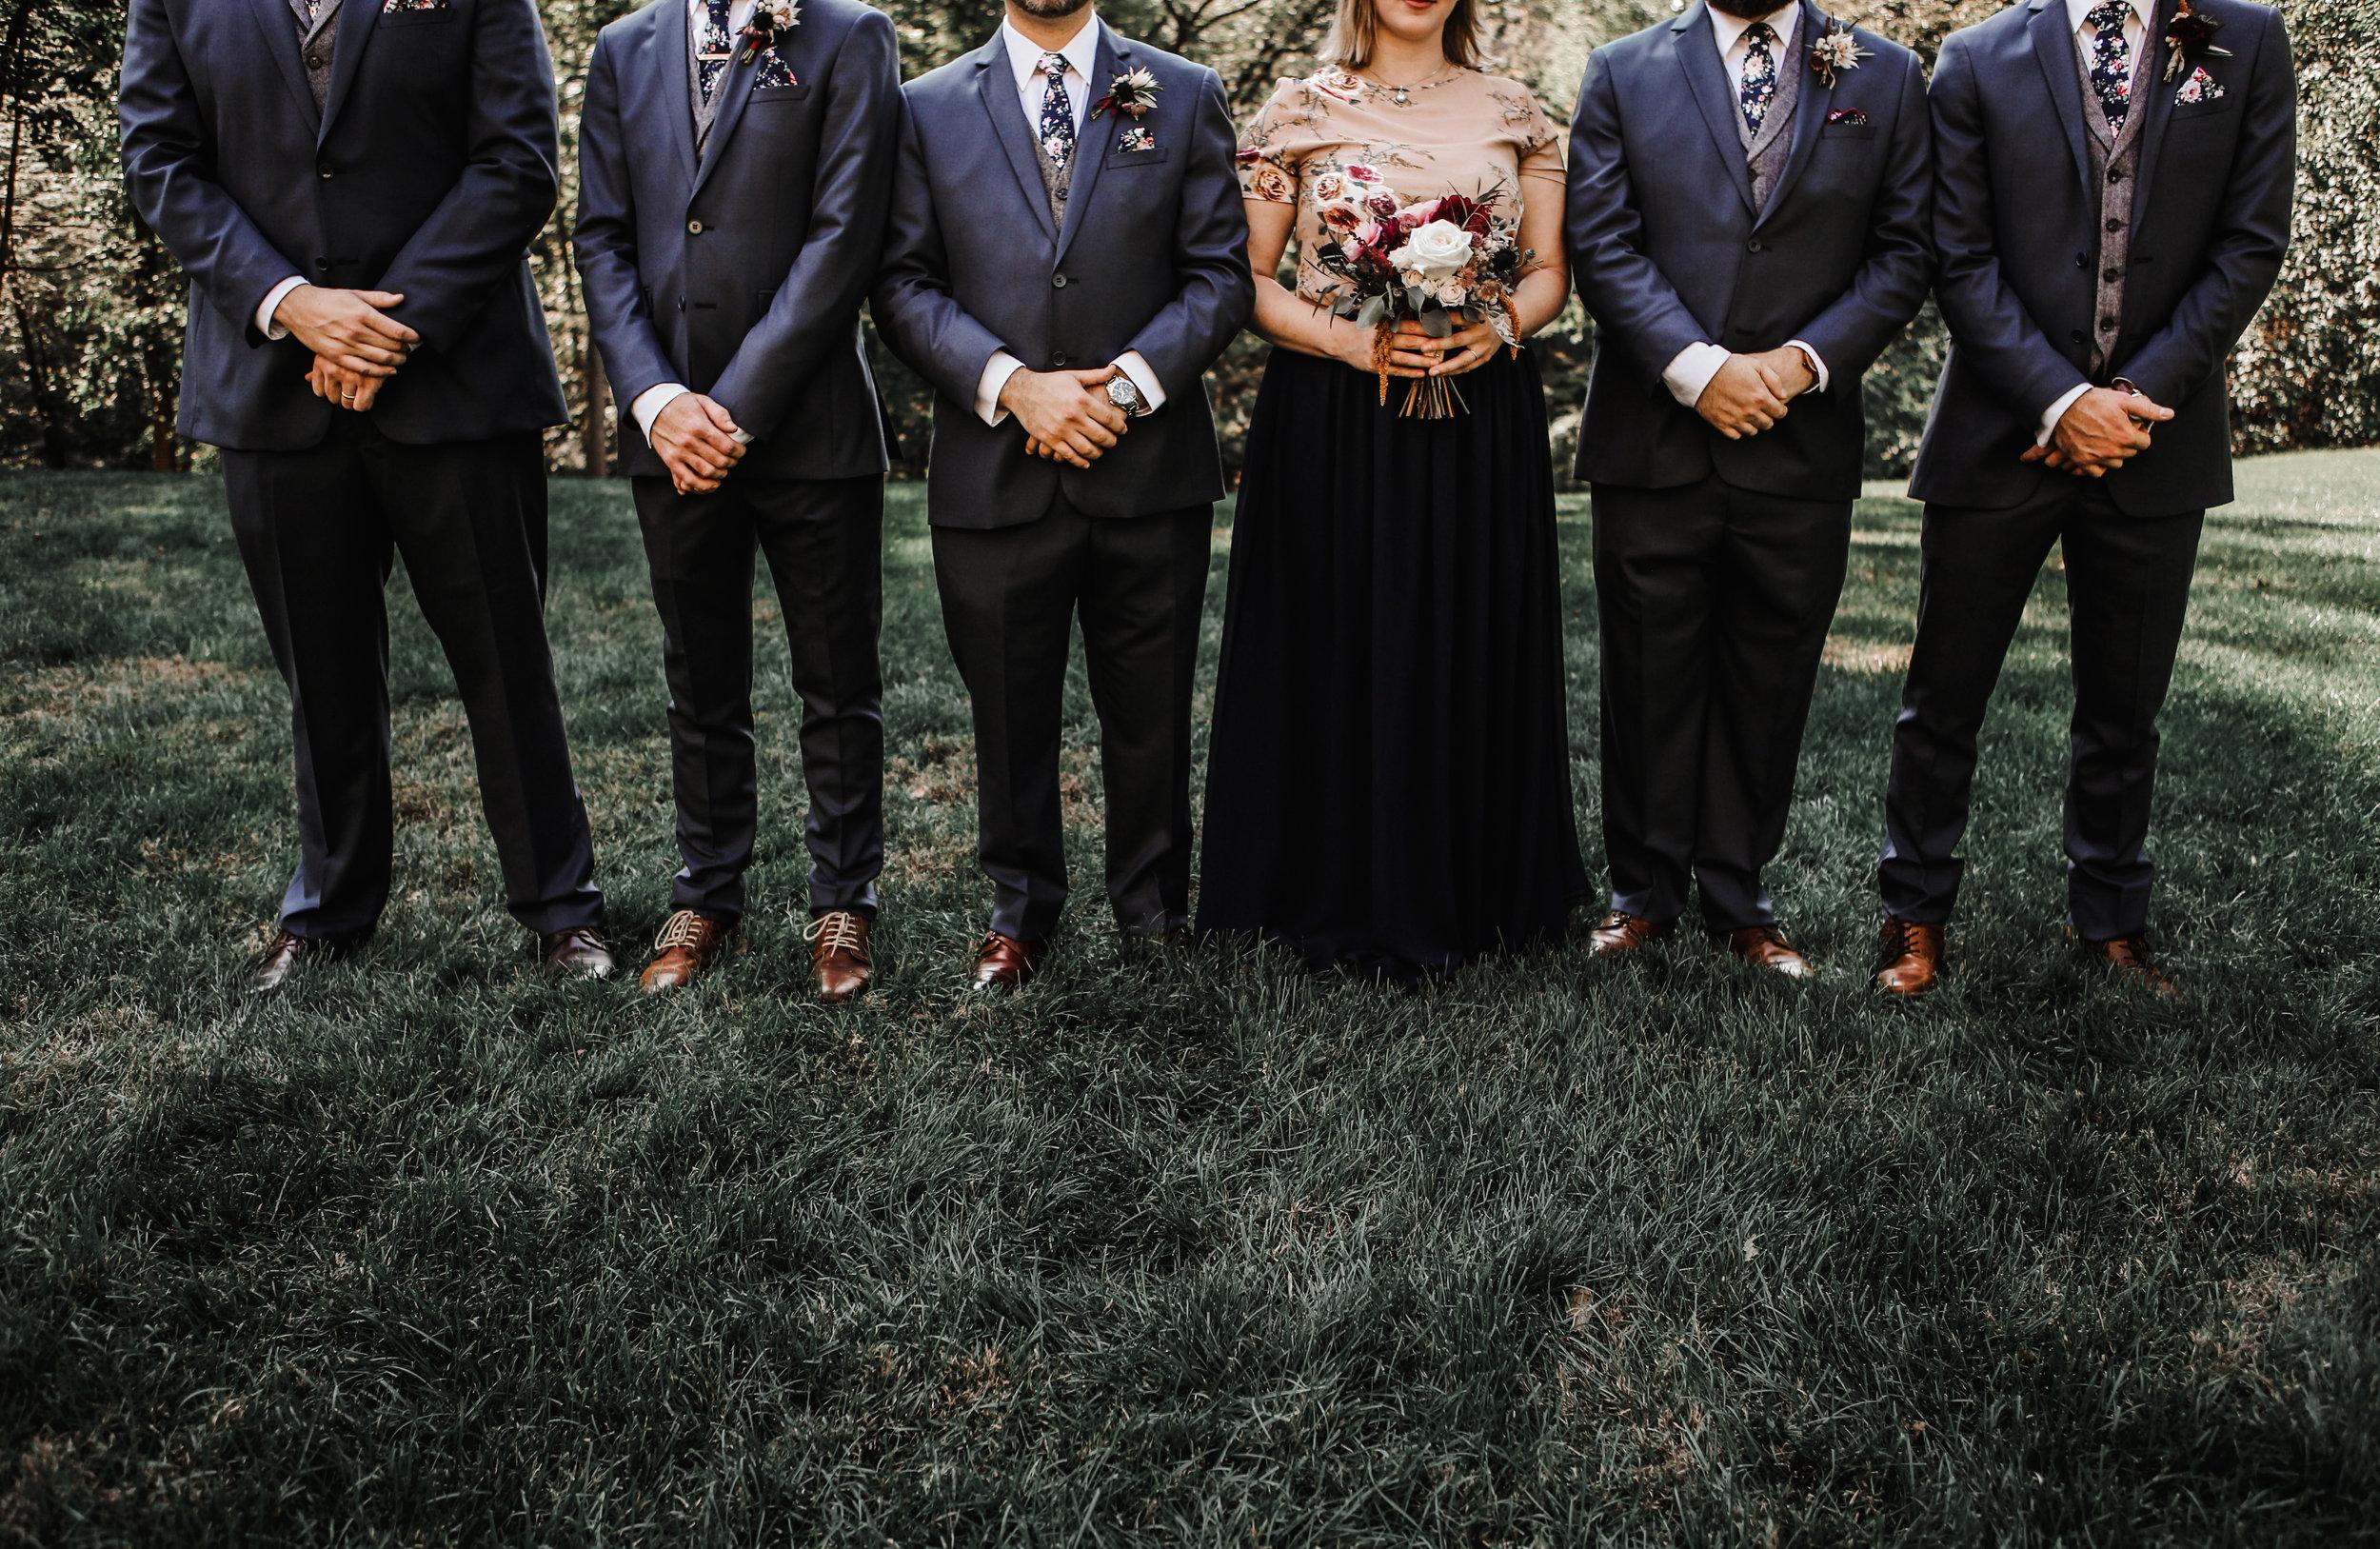 LDP_McNeiveWedding_WeddingParty_019.JPG